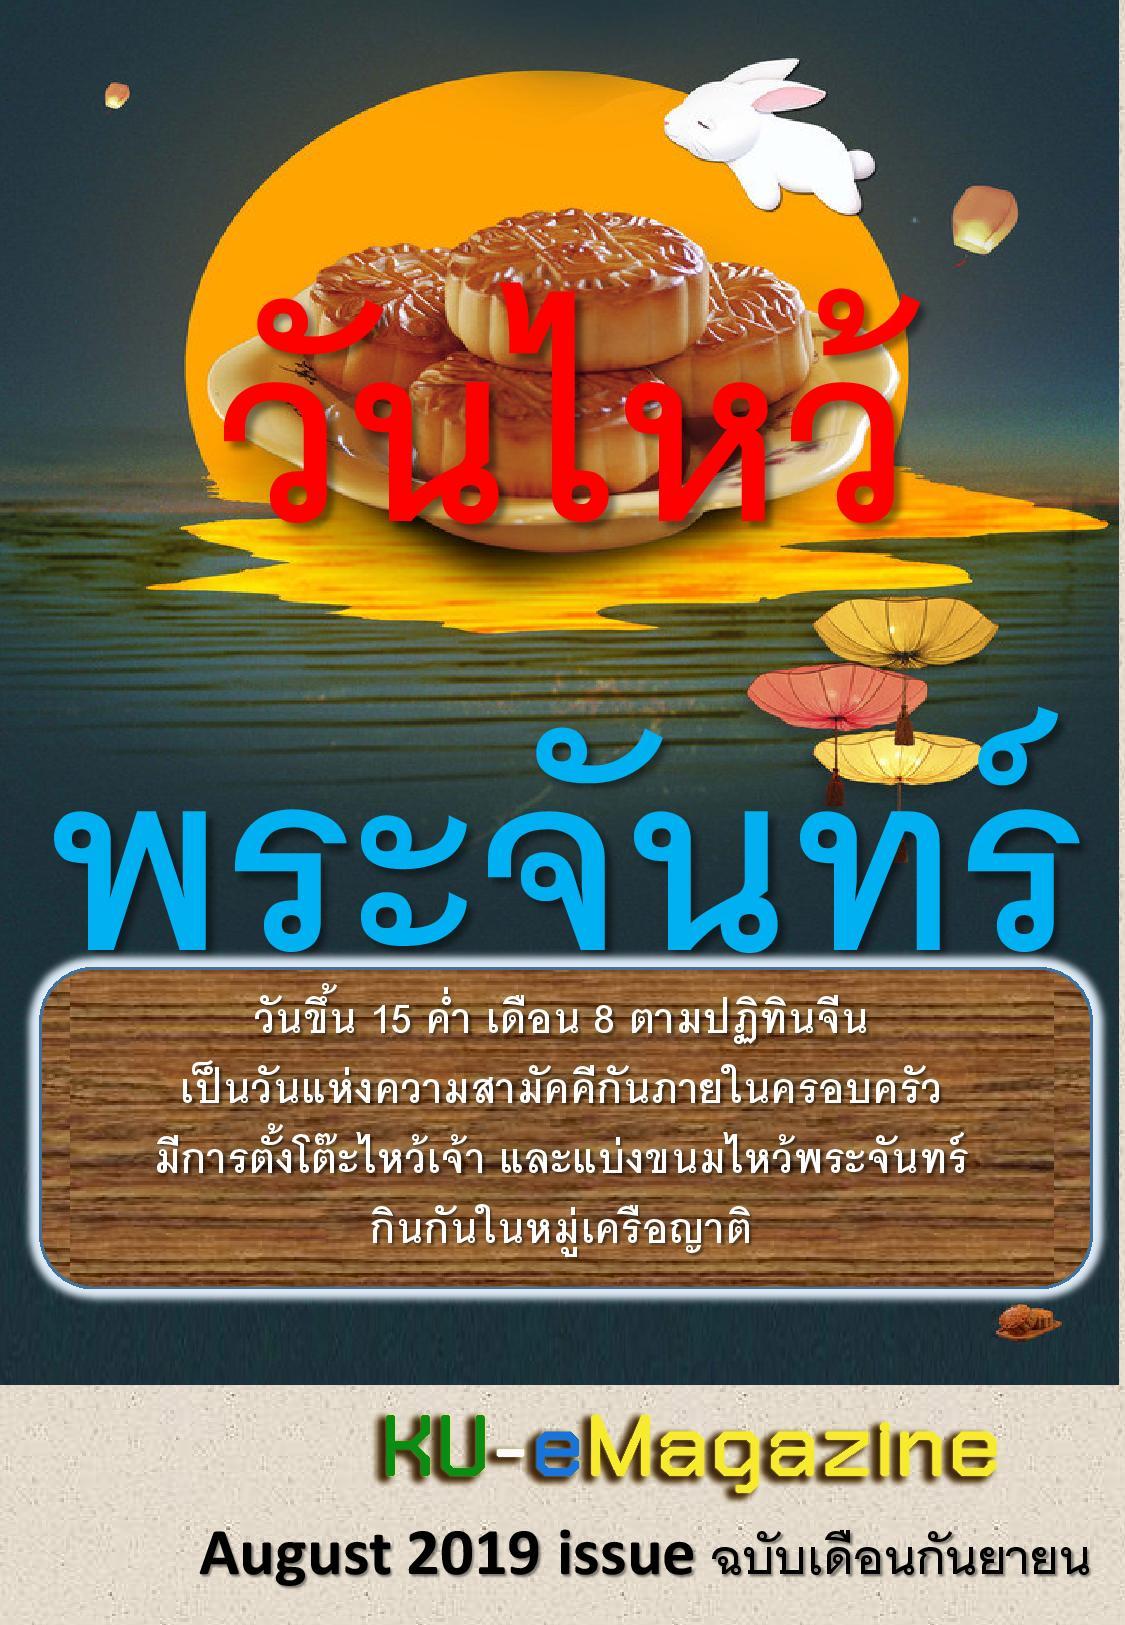 kuemagazine-september19-page-001